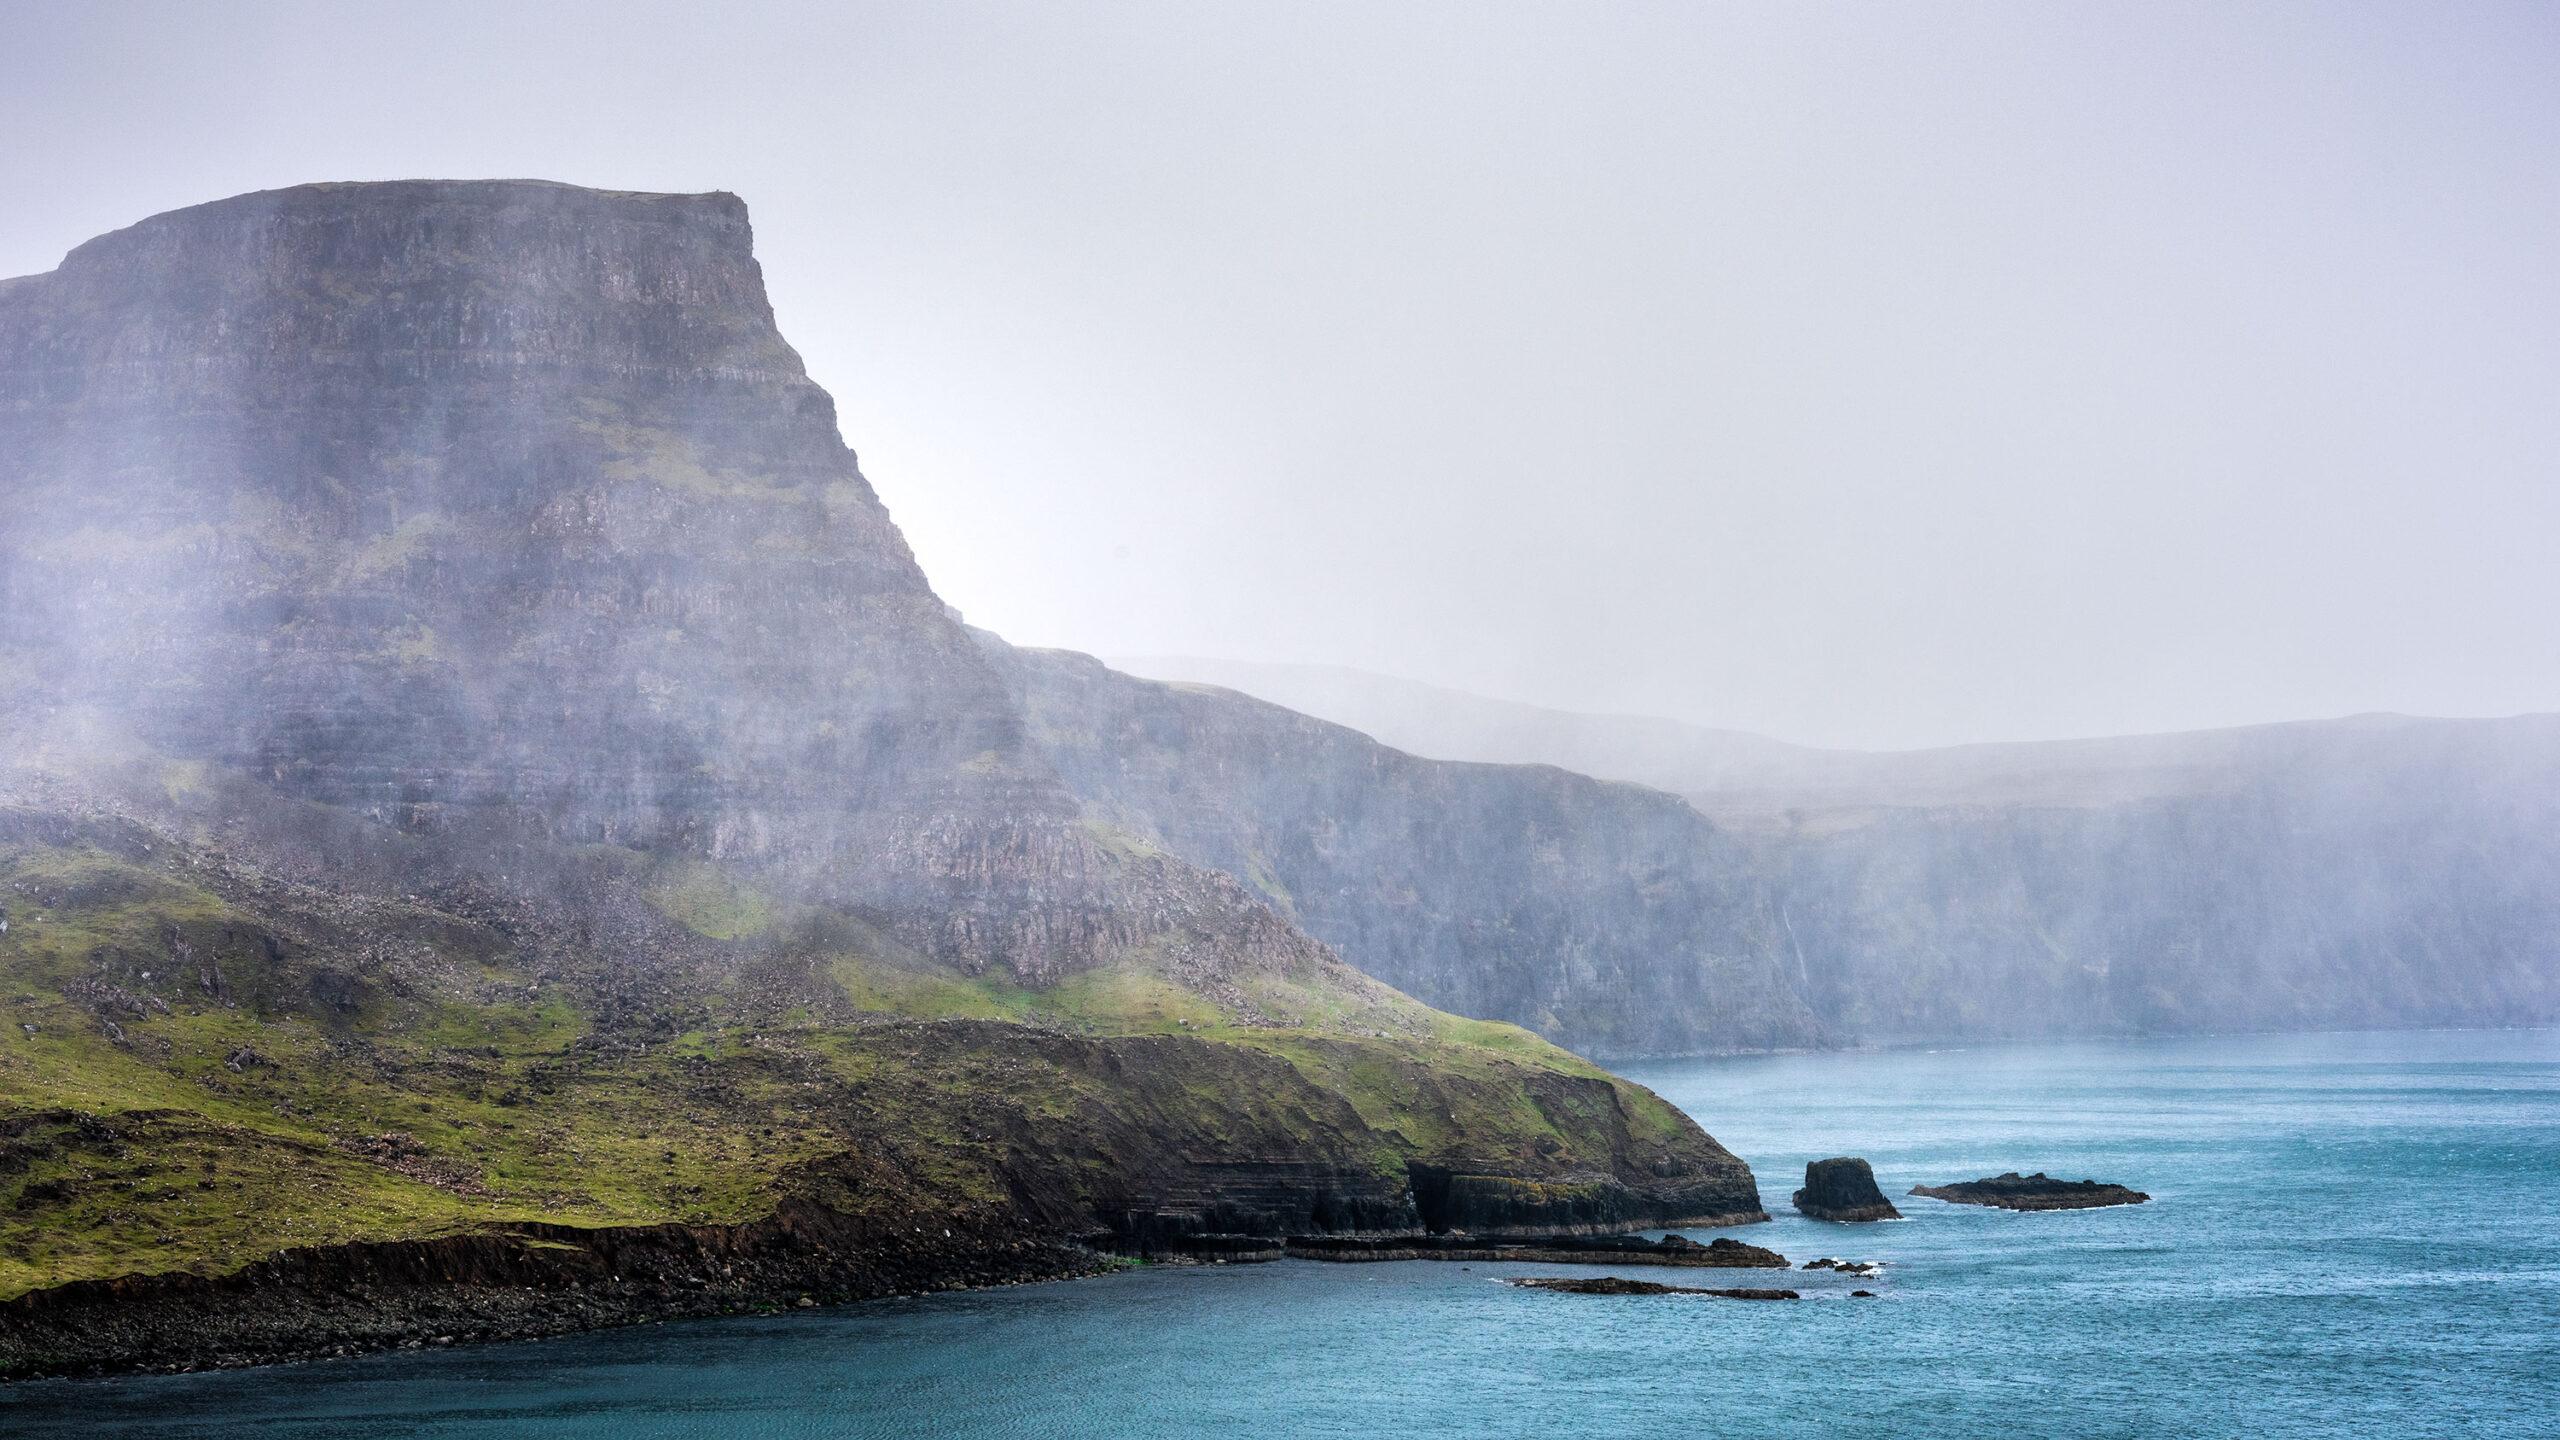 Dramatic landscape photography taken at Neist Point on Skye Island by the photographer Jennifer Esseiva.